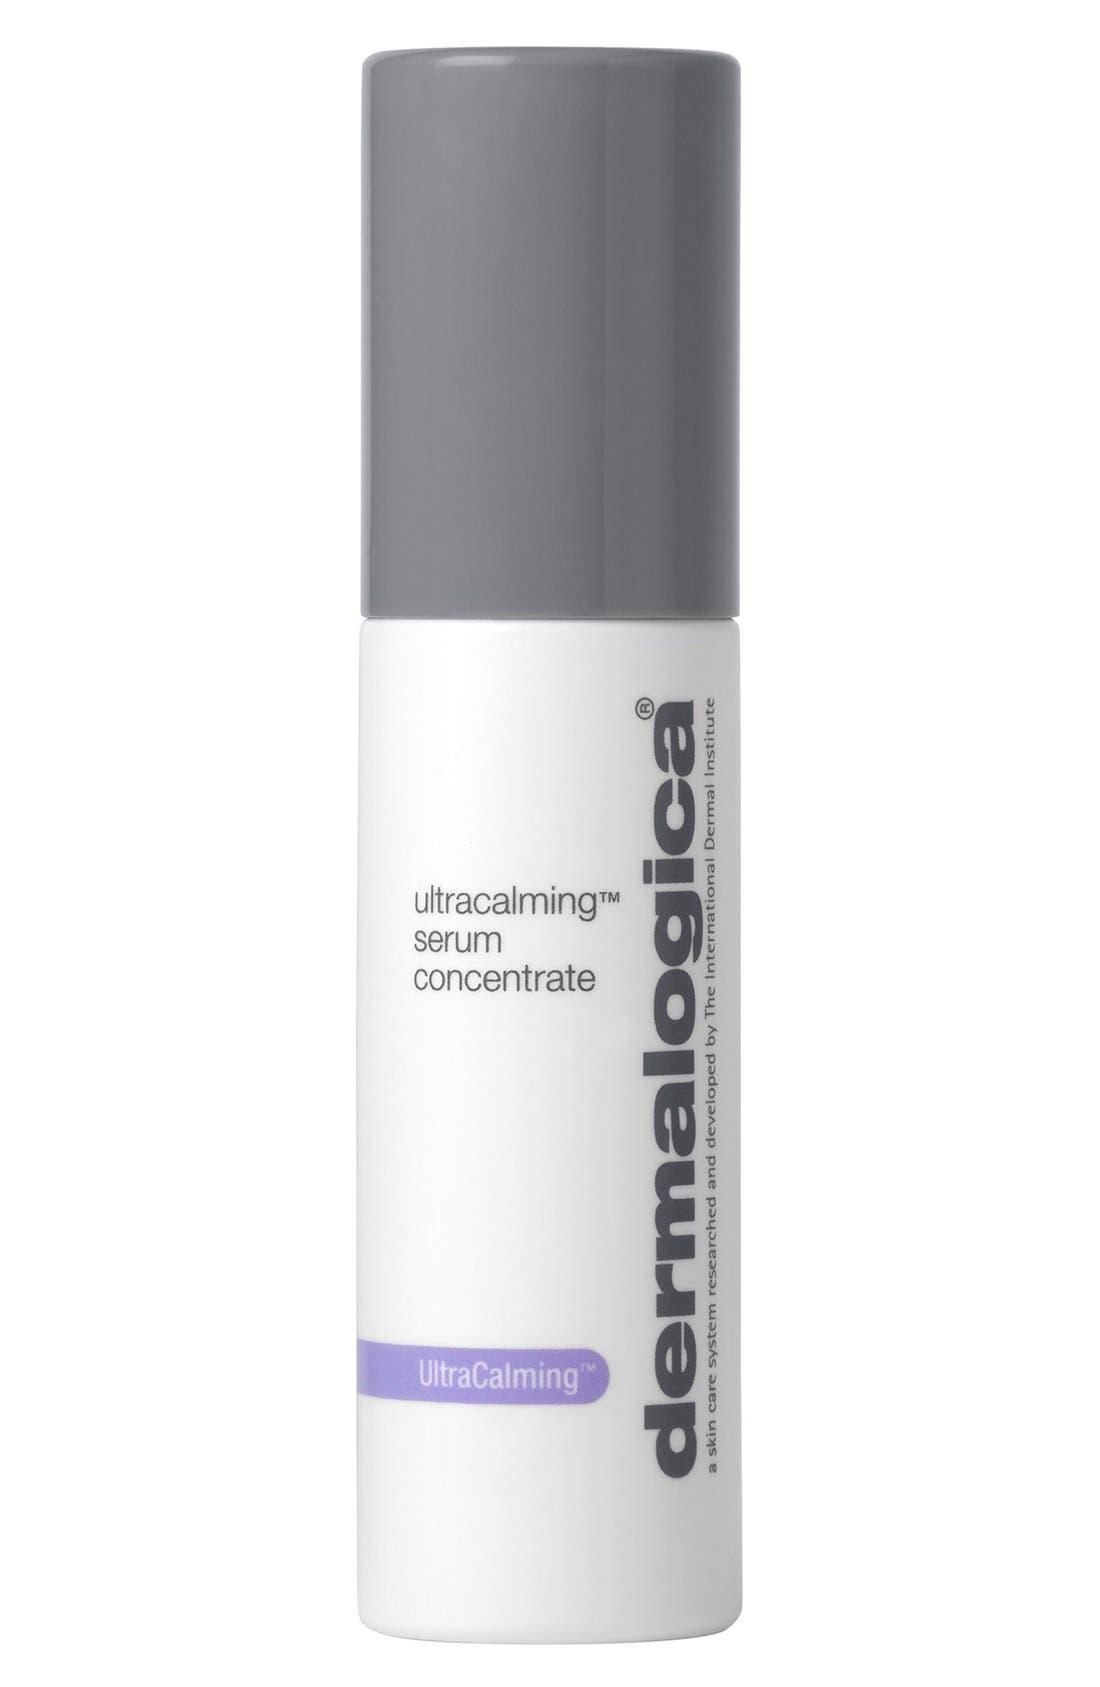 Dermalogica Ultracalming(TM) Serum Concentrate